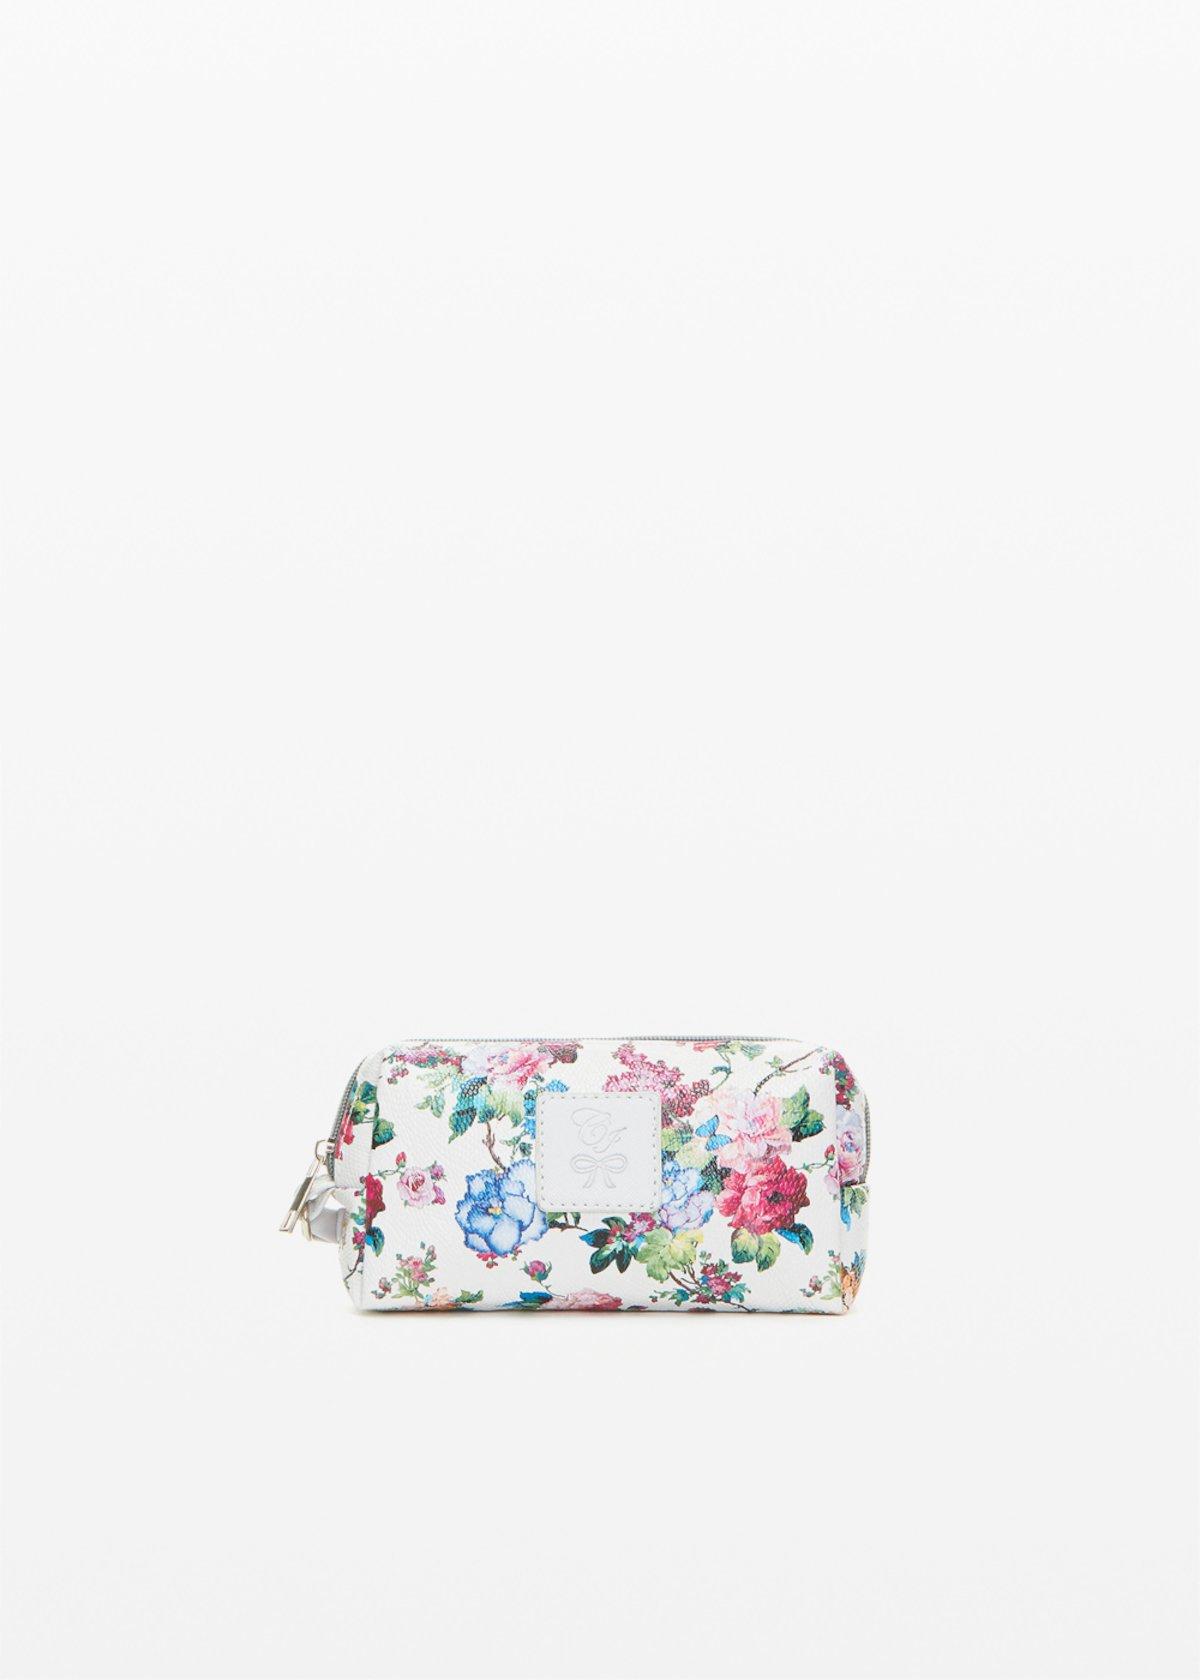 Beauty Briccofl1 in ecopelle flowers print - Light Grey Fantasia - Donna - Immagine categoria